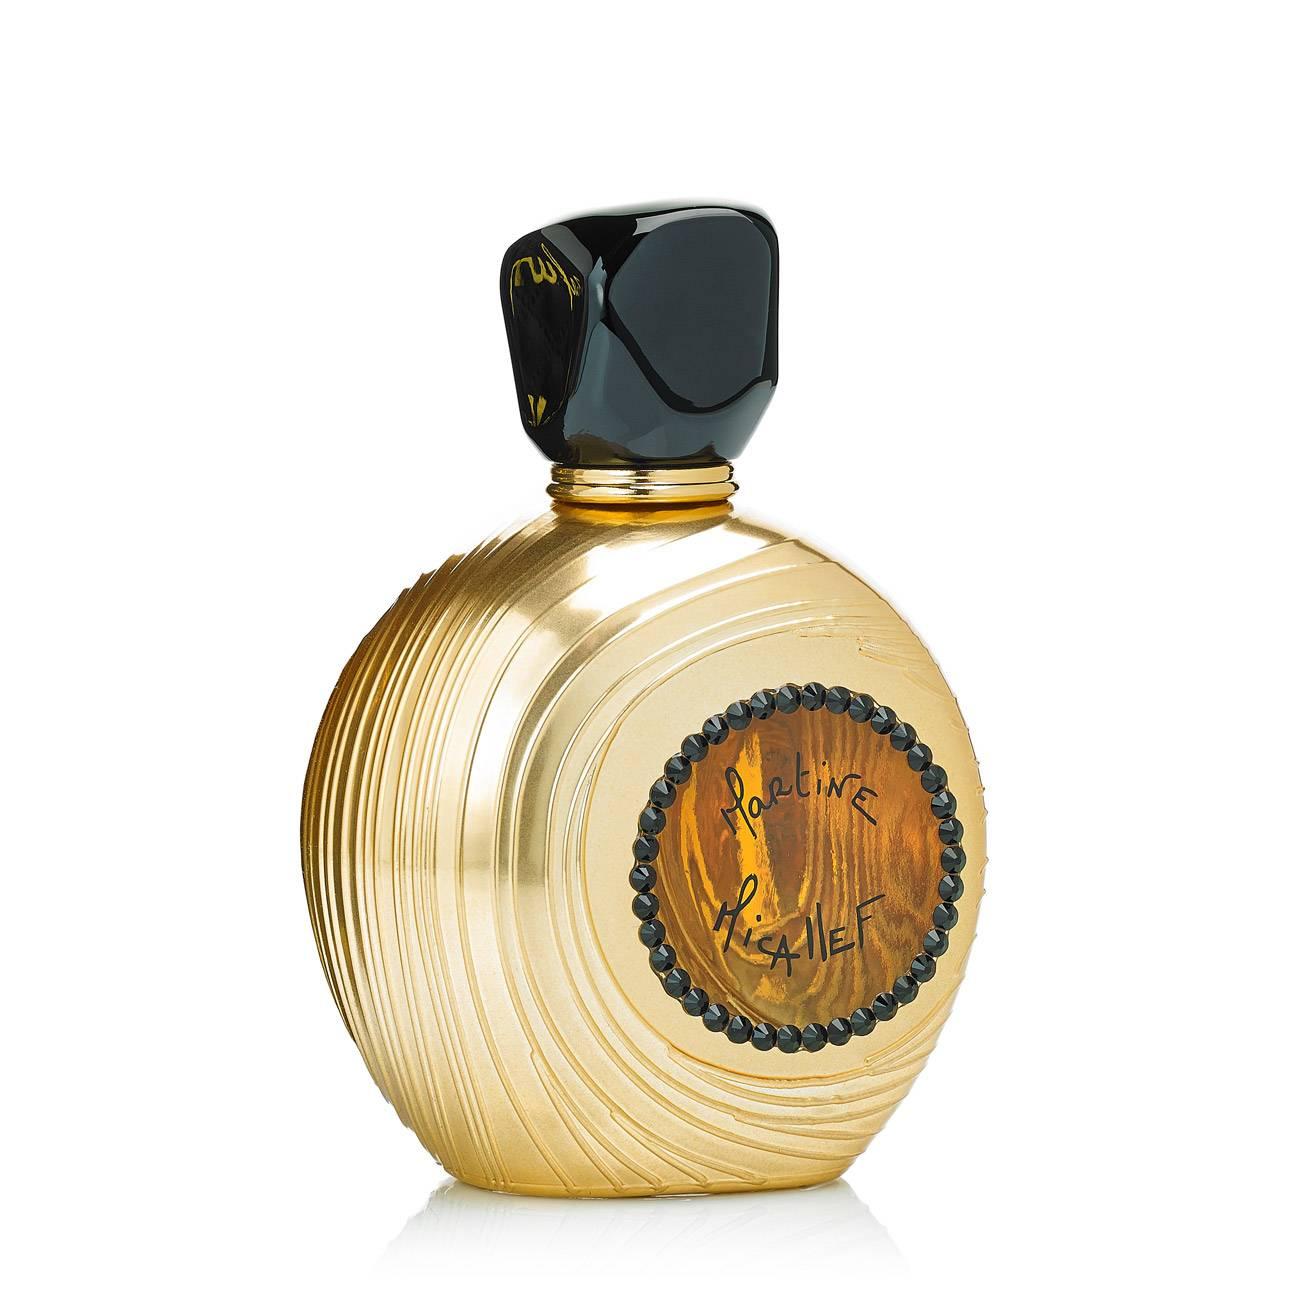 Mon Parfum Gold 100ml M. Micallef imagine 2021 bestvalue.eu